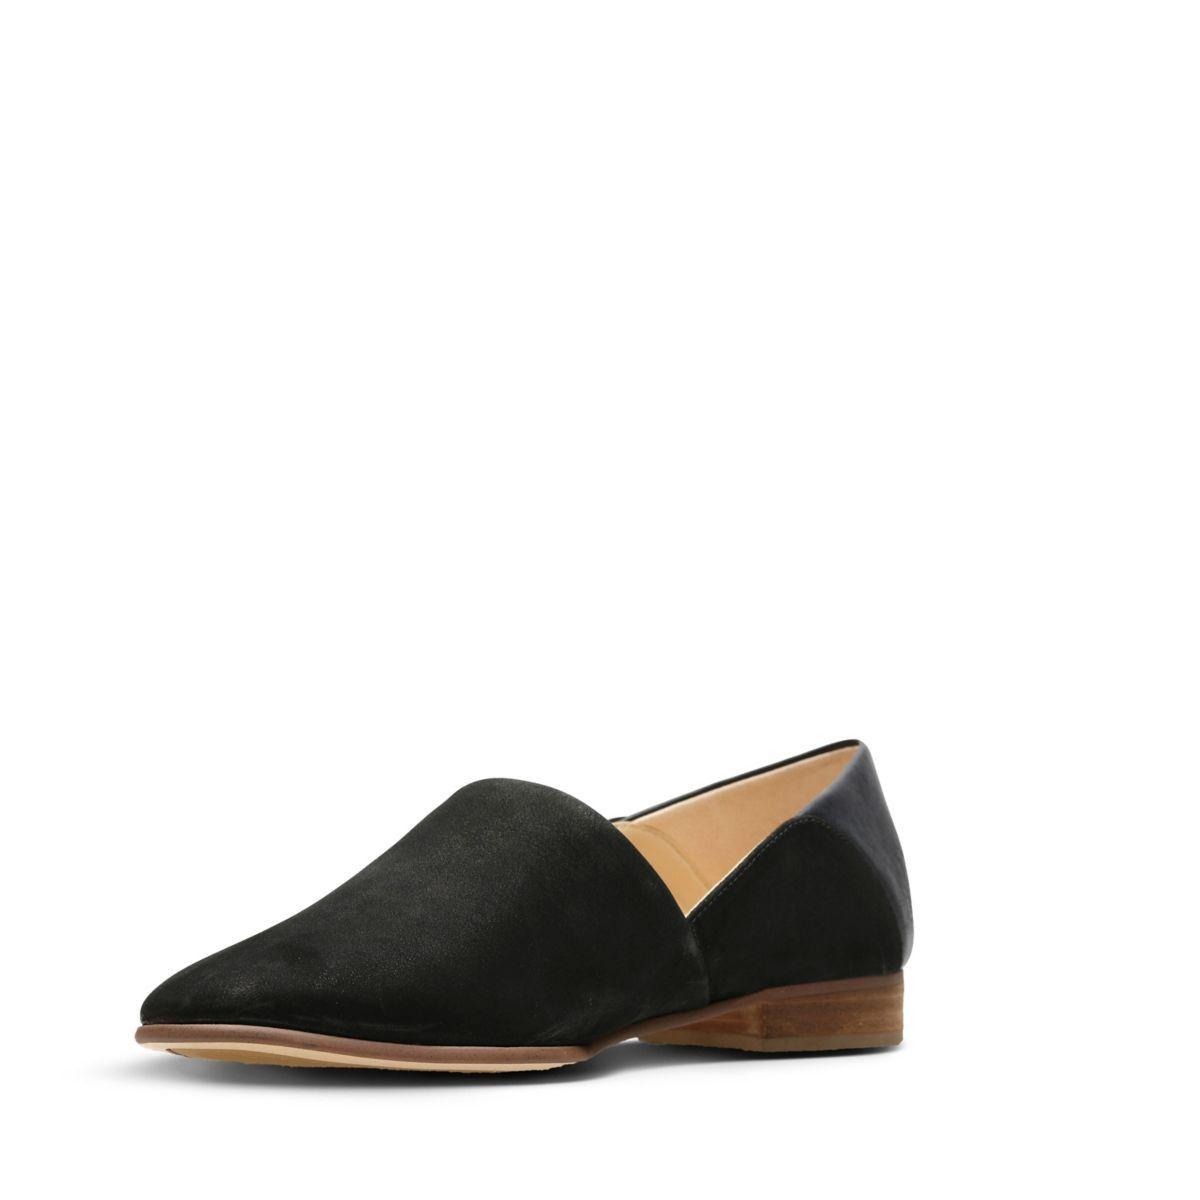 b385fbe77 Clarks Pure Tone - Womens Shoes Black Combination 8.5  NudeWomensShoes   womenshoesblack